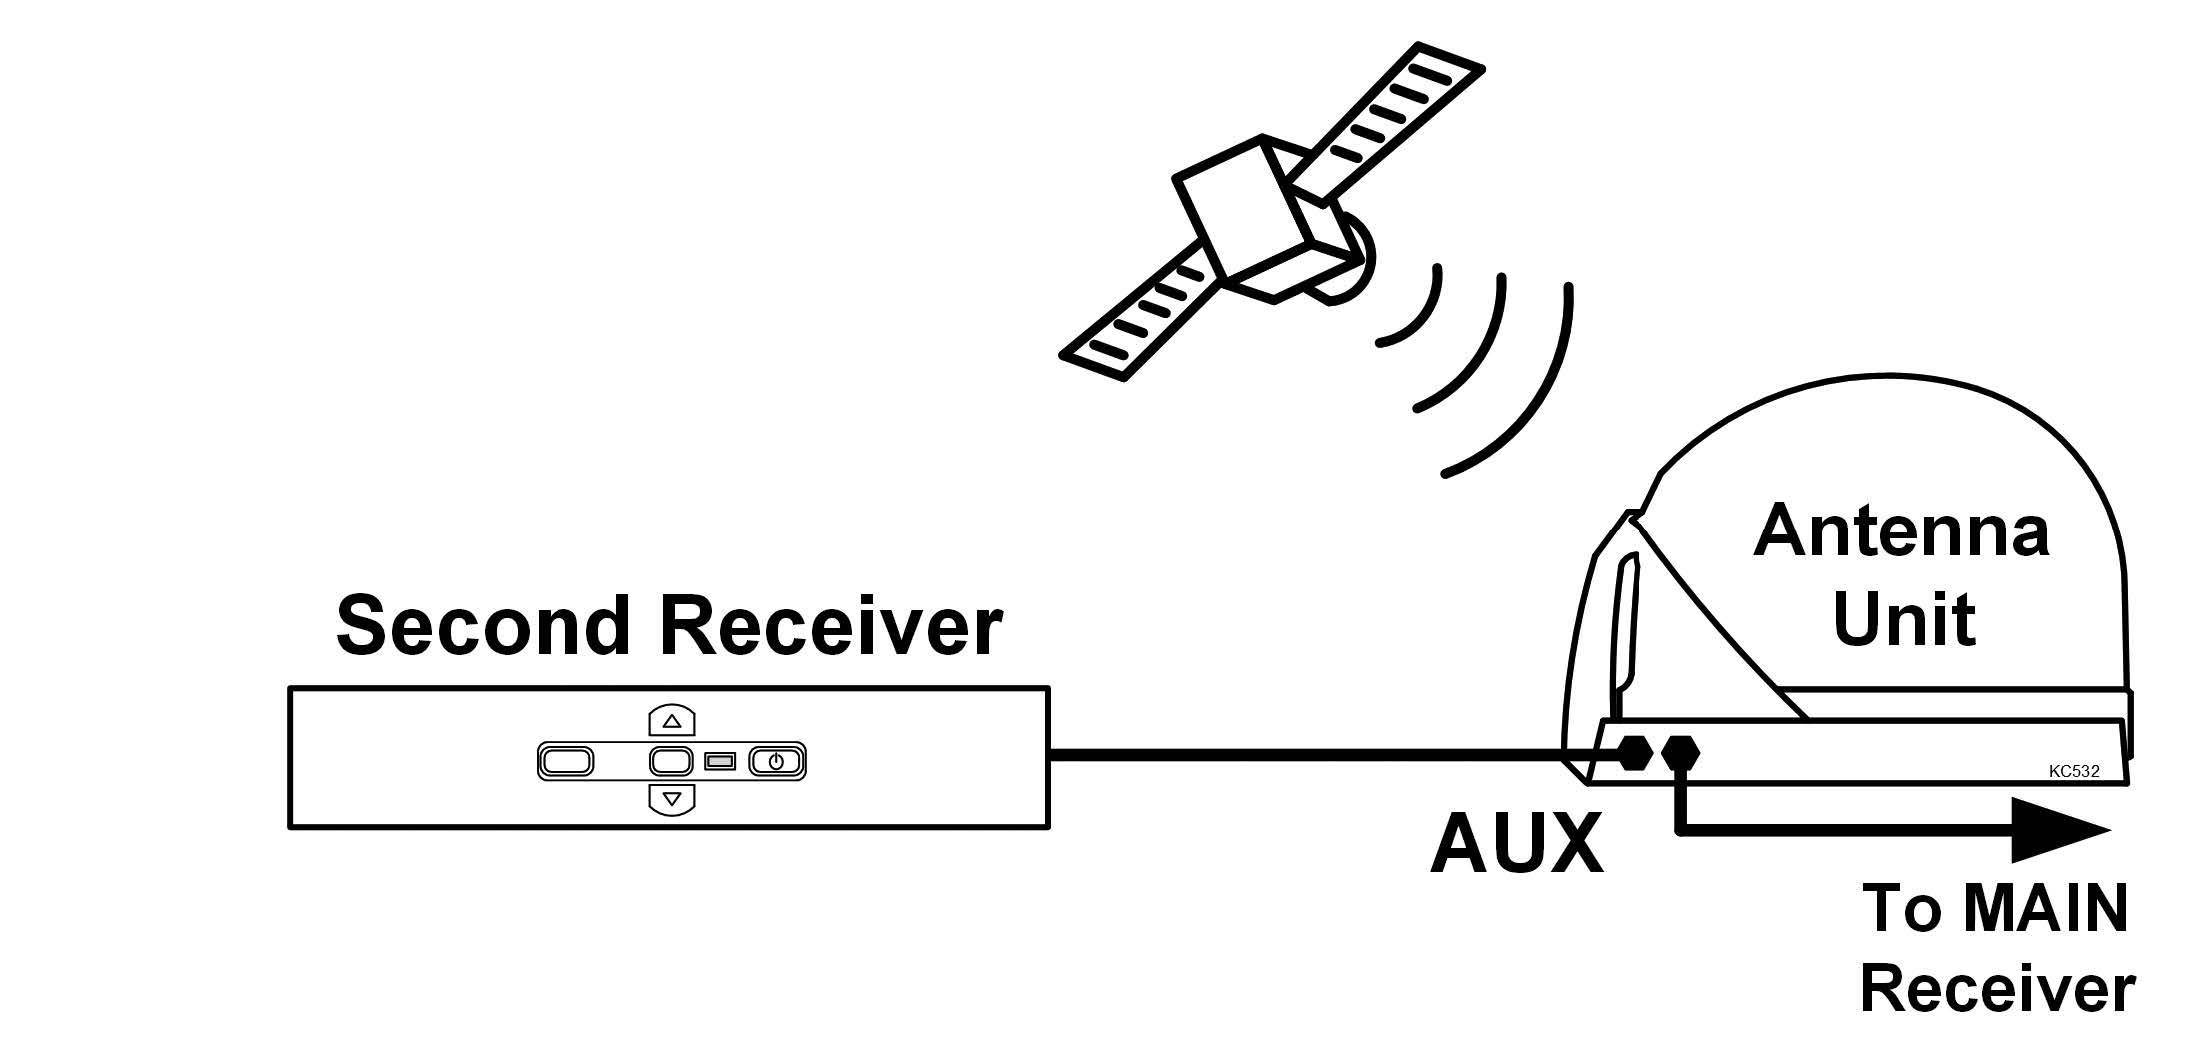 Dish Network Wiring Diagram 722 : Dish Vip722K Wiring